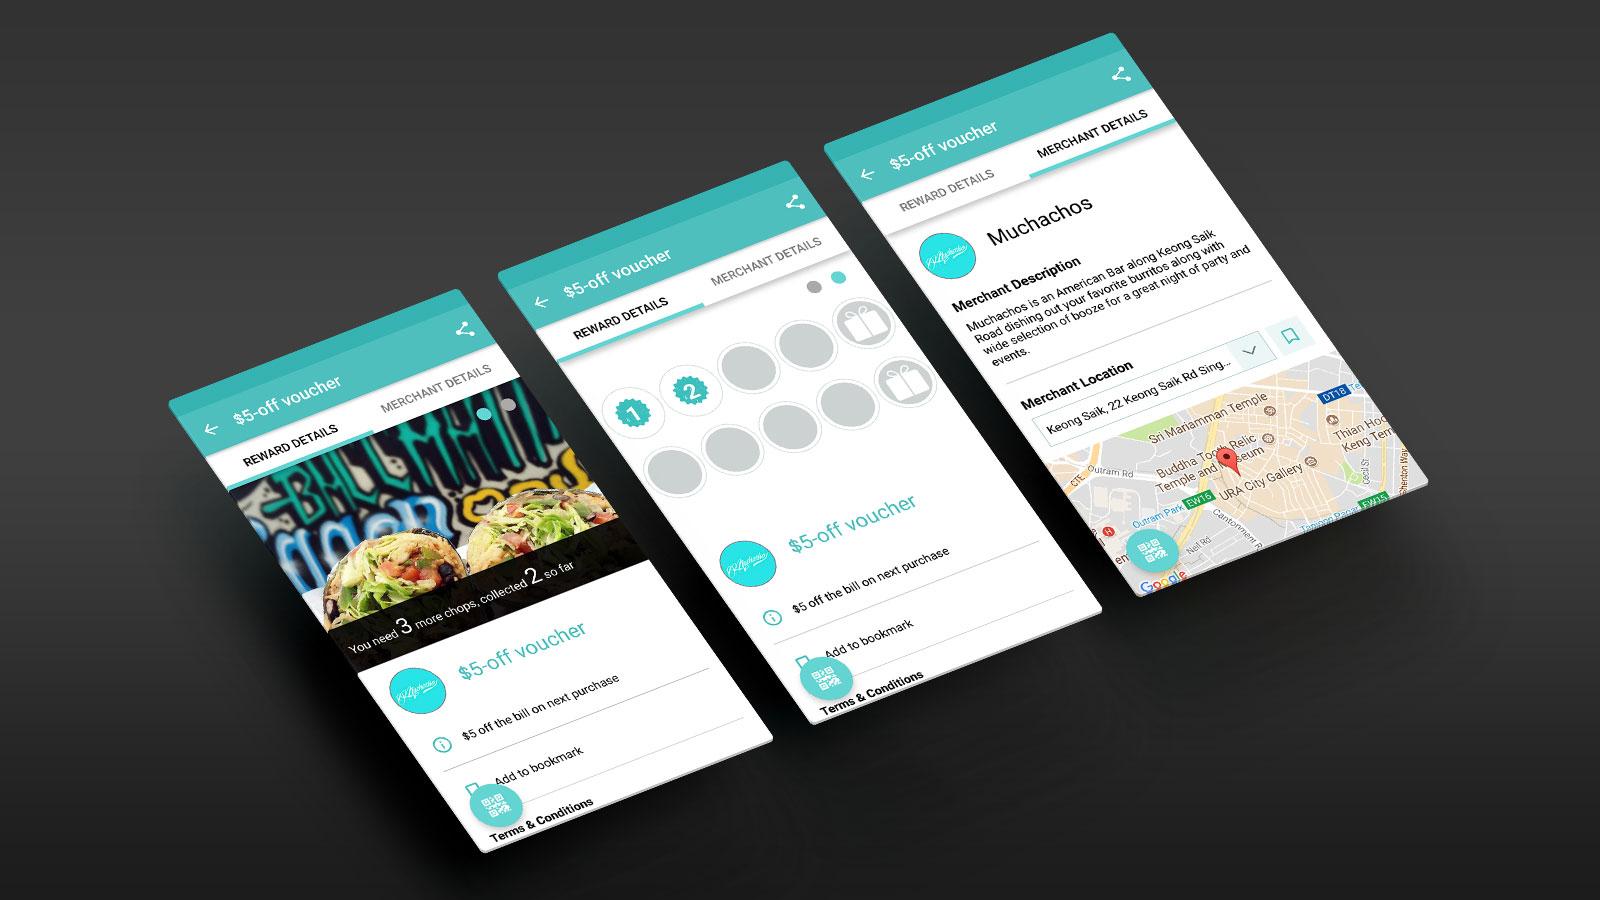 perx-app-layout